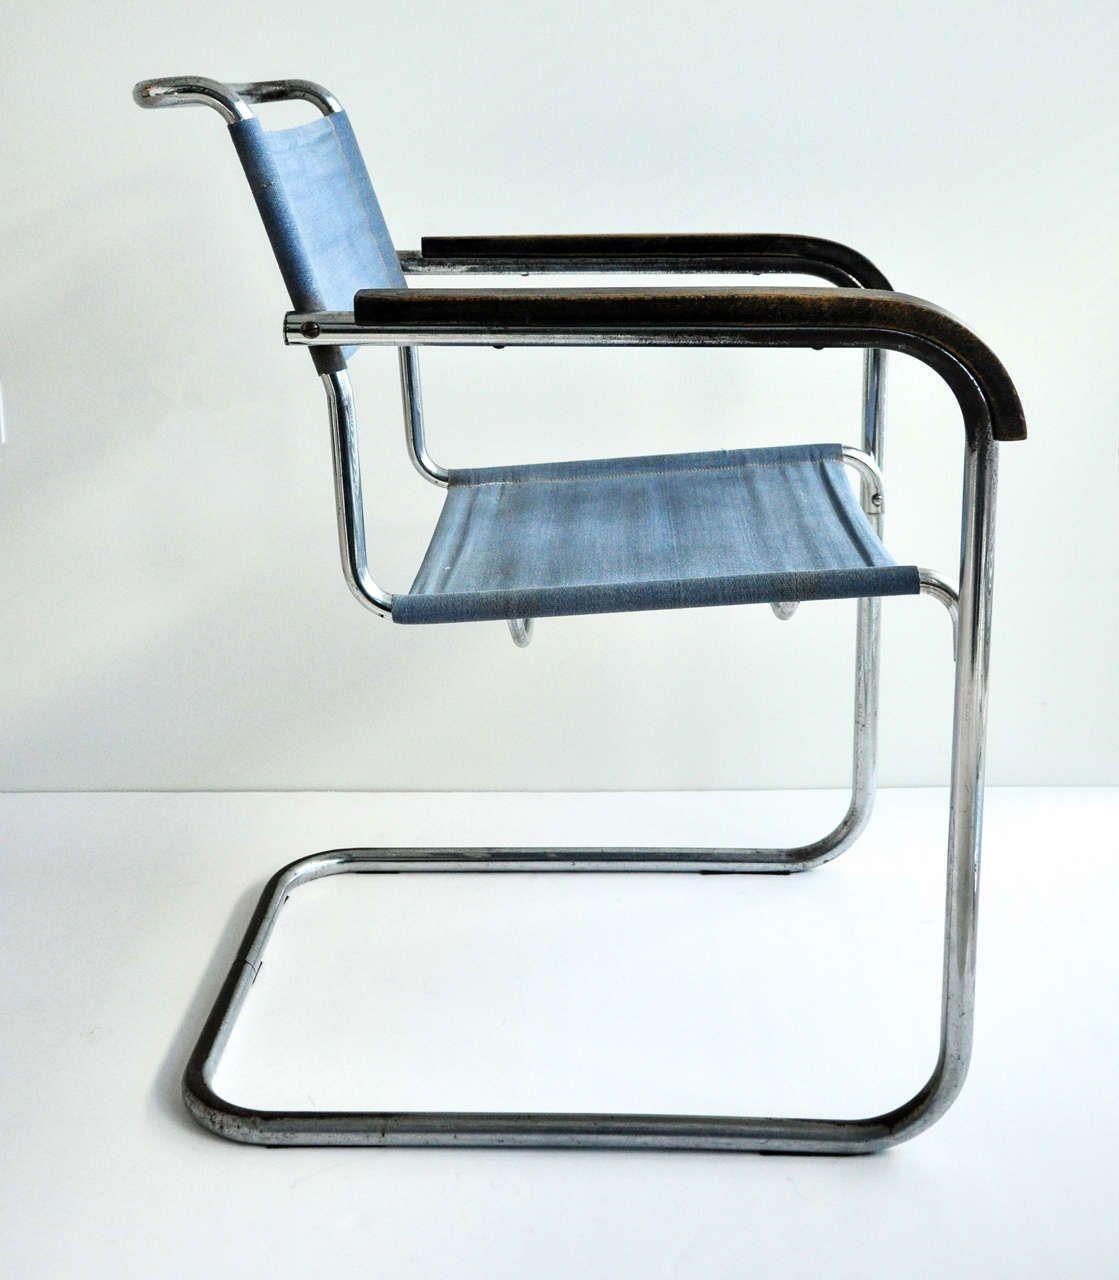 Bauhaus tubular steel lounge chair at 1stdibs - Marcel Breuer Tubular Steel Armchair For Thonet Bauhaus